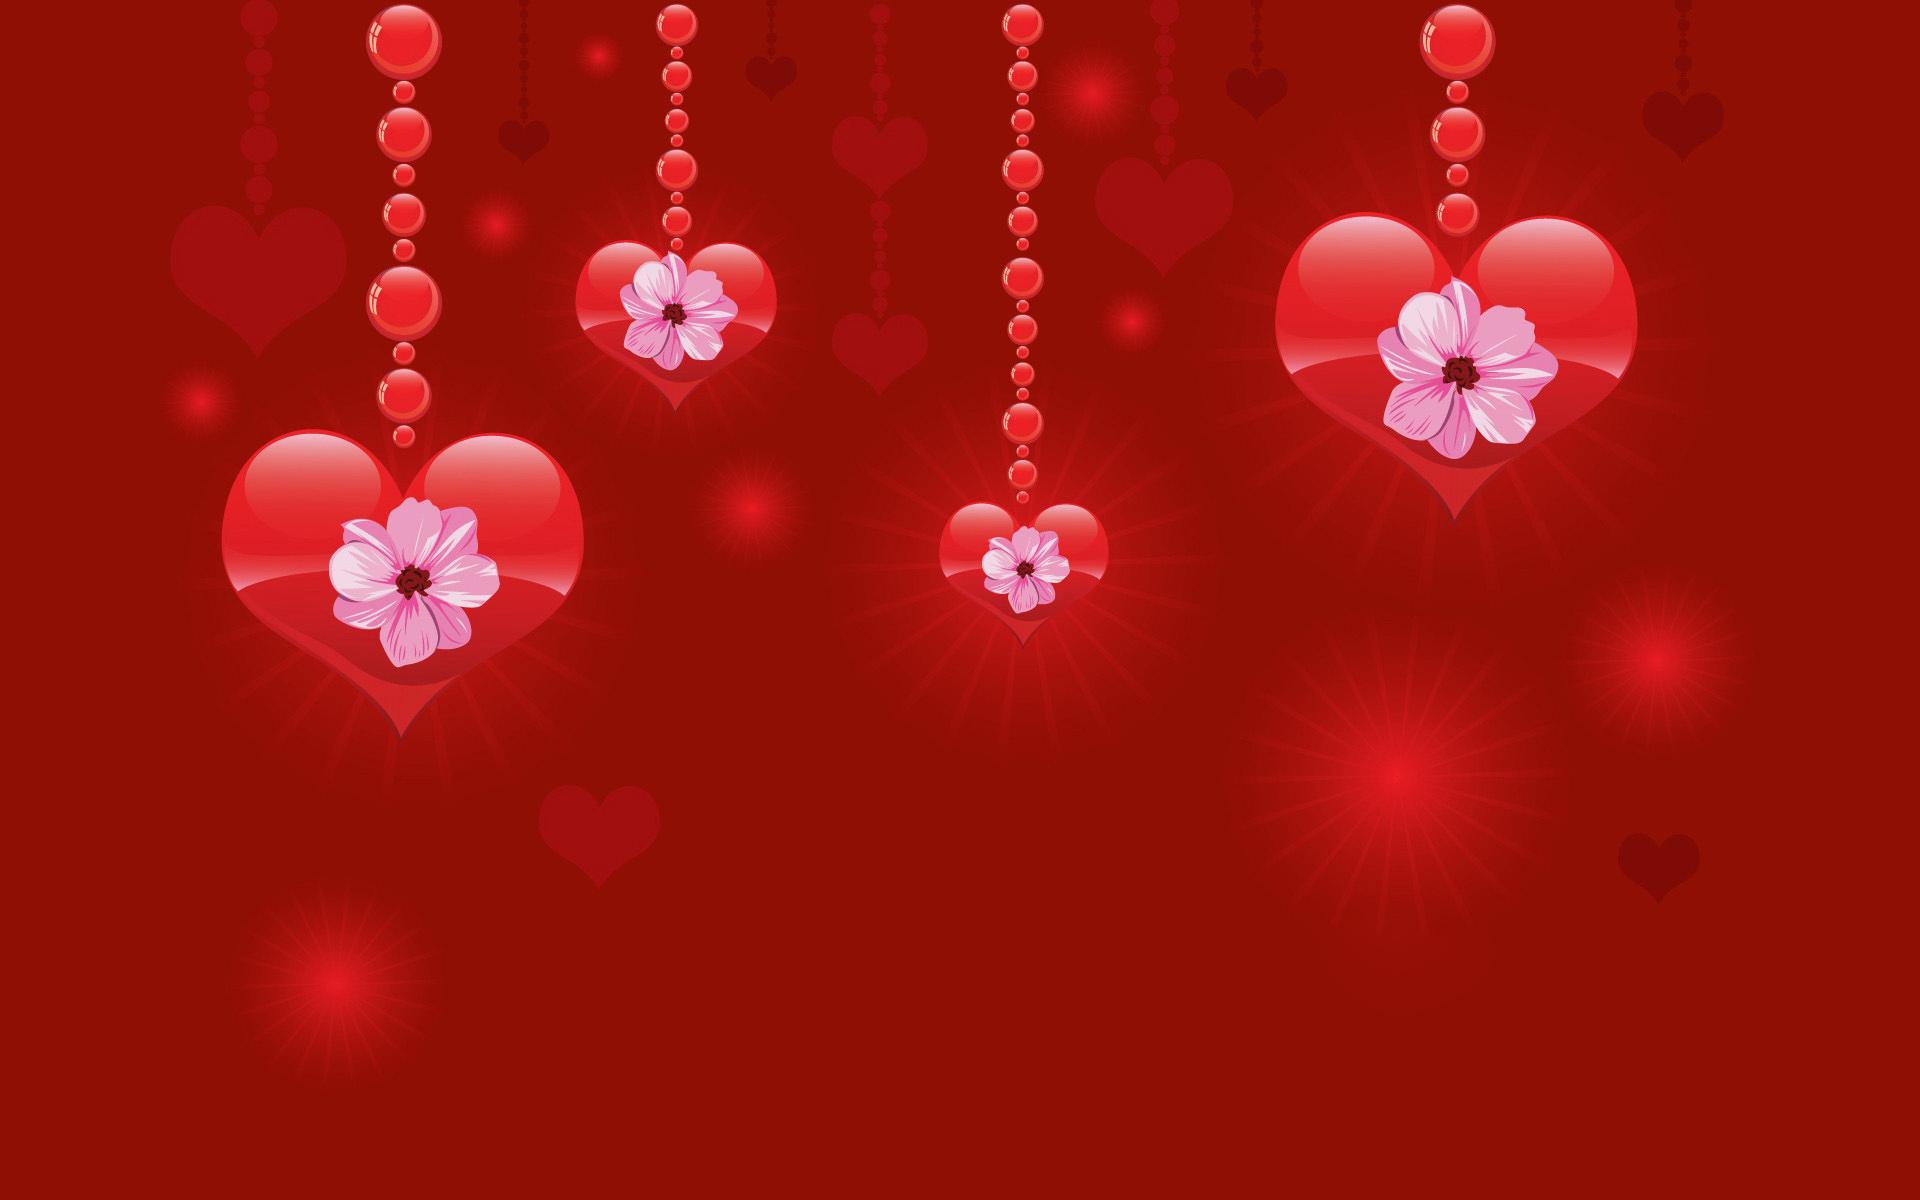 Desktop Wallpaper Valentine's Day - WallpaperSafari